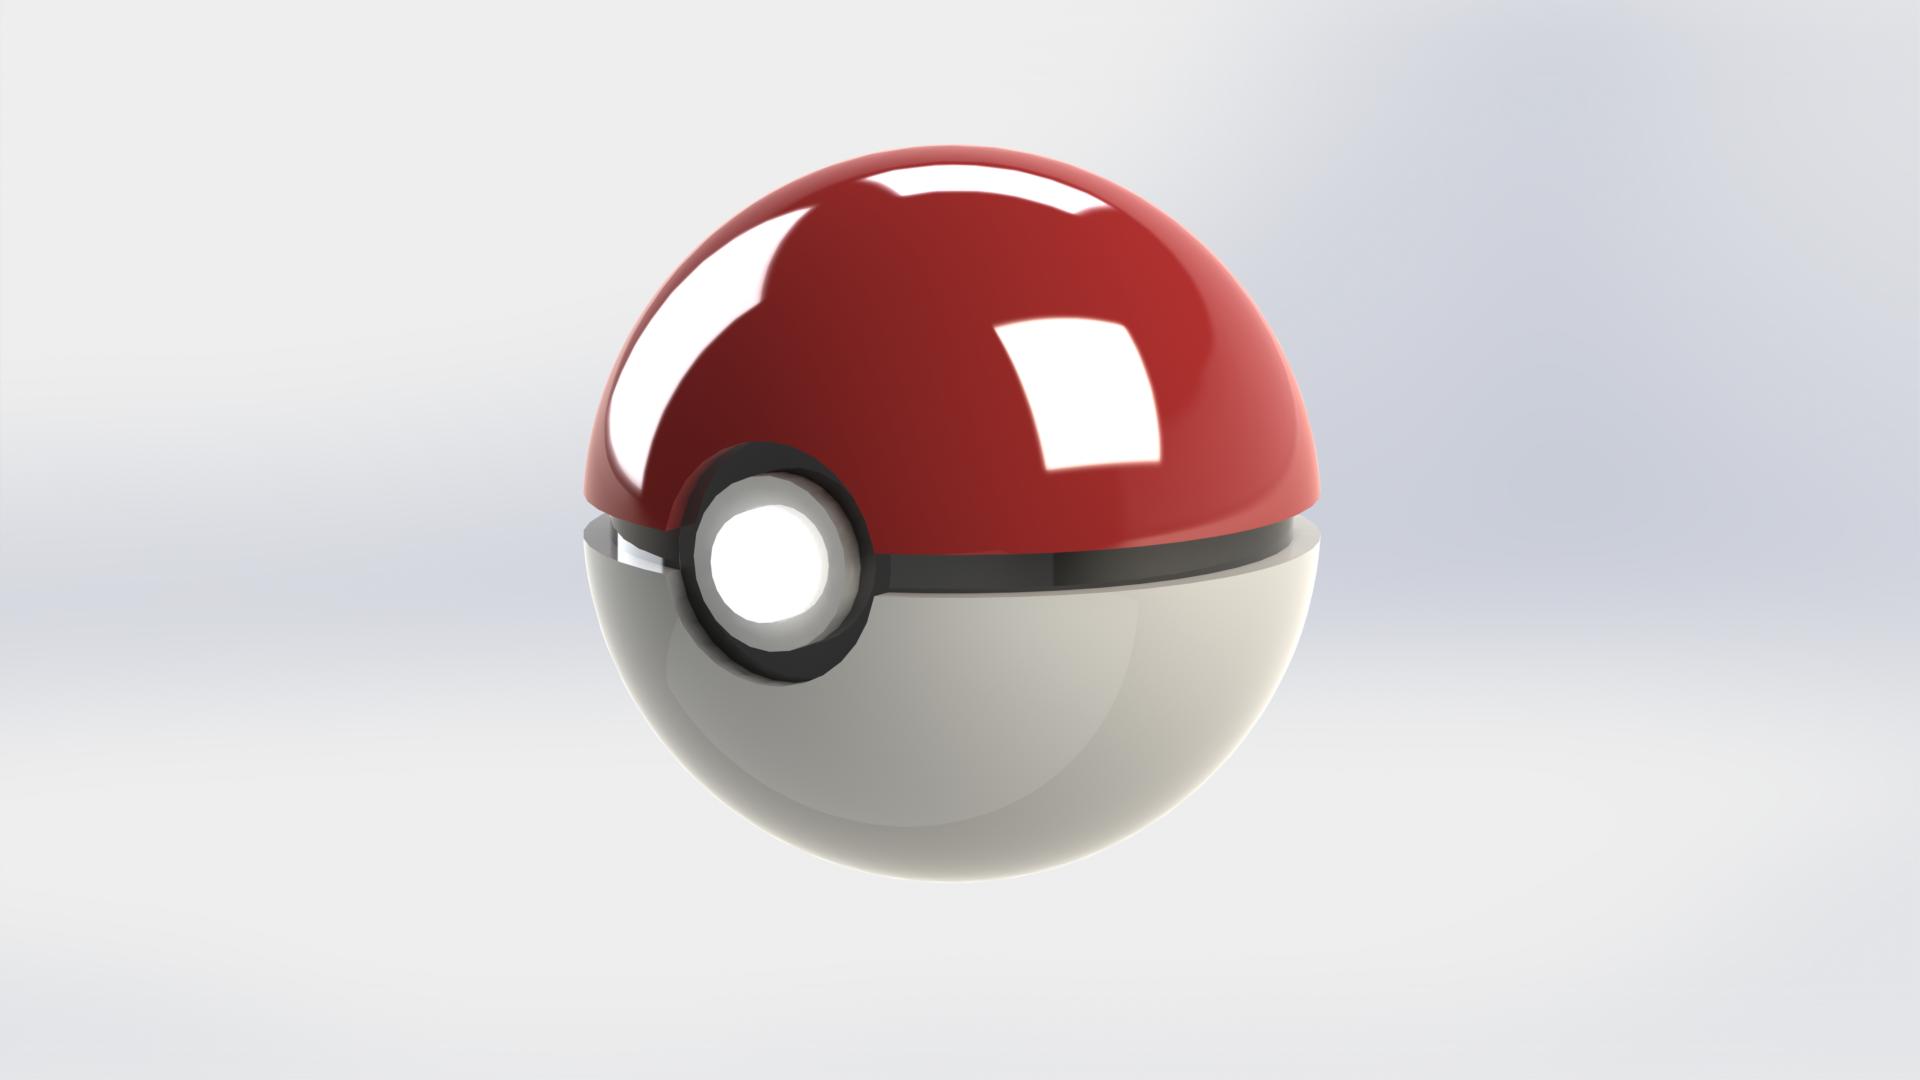 Pokeball Pokemon Ball Hd Picture Image 45346